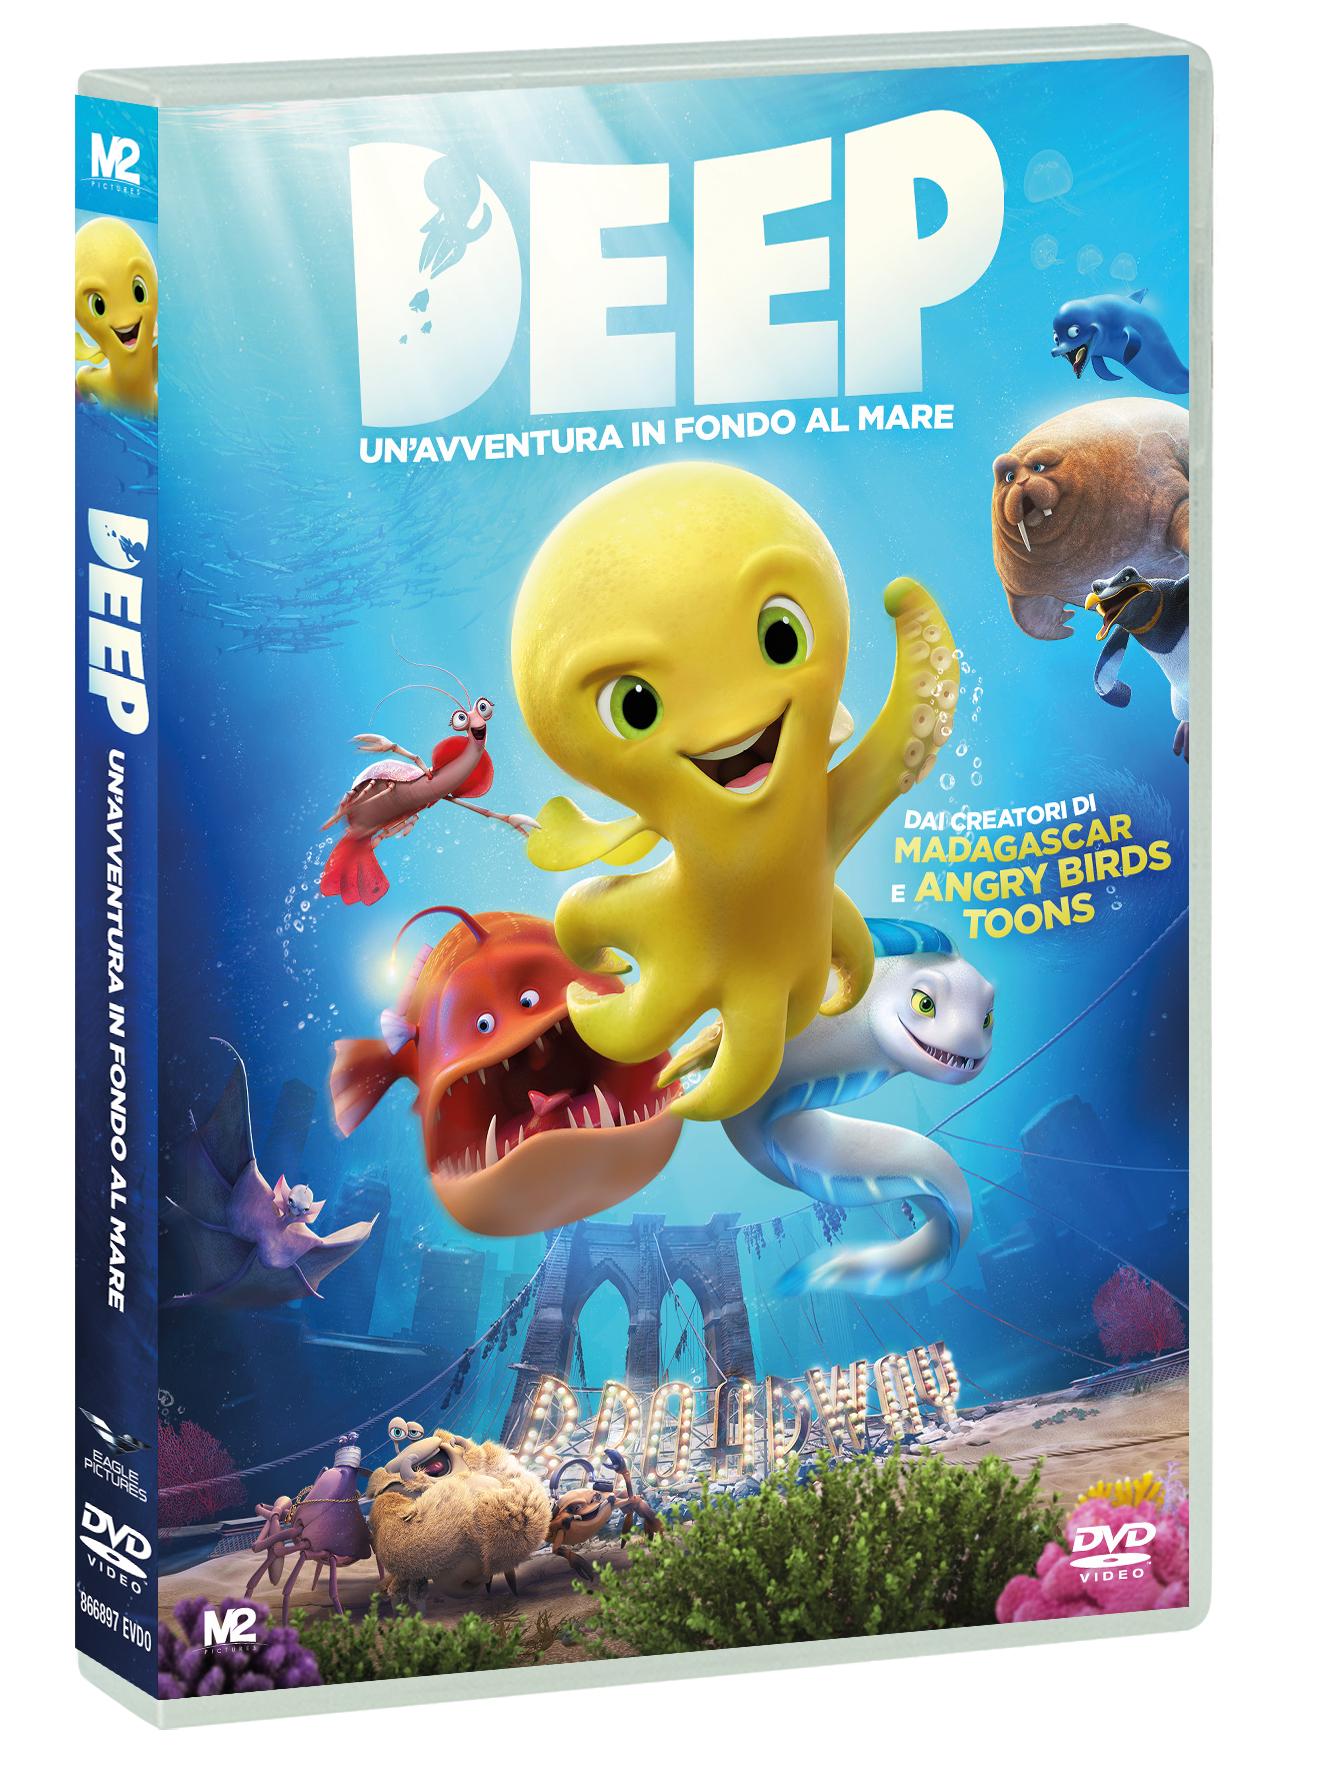 DEEP - UN'AVVENTURA IN FONDO AL MARE (DVD)